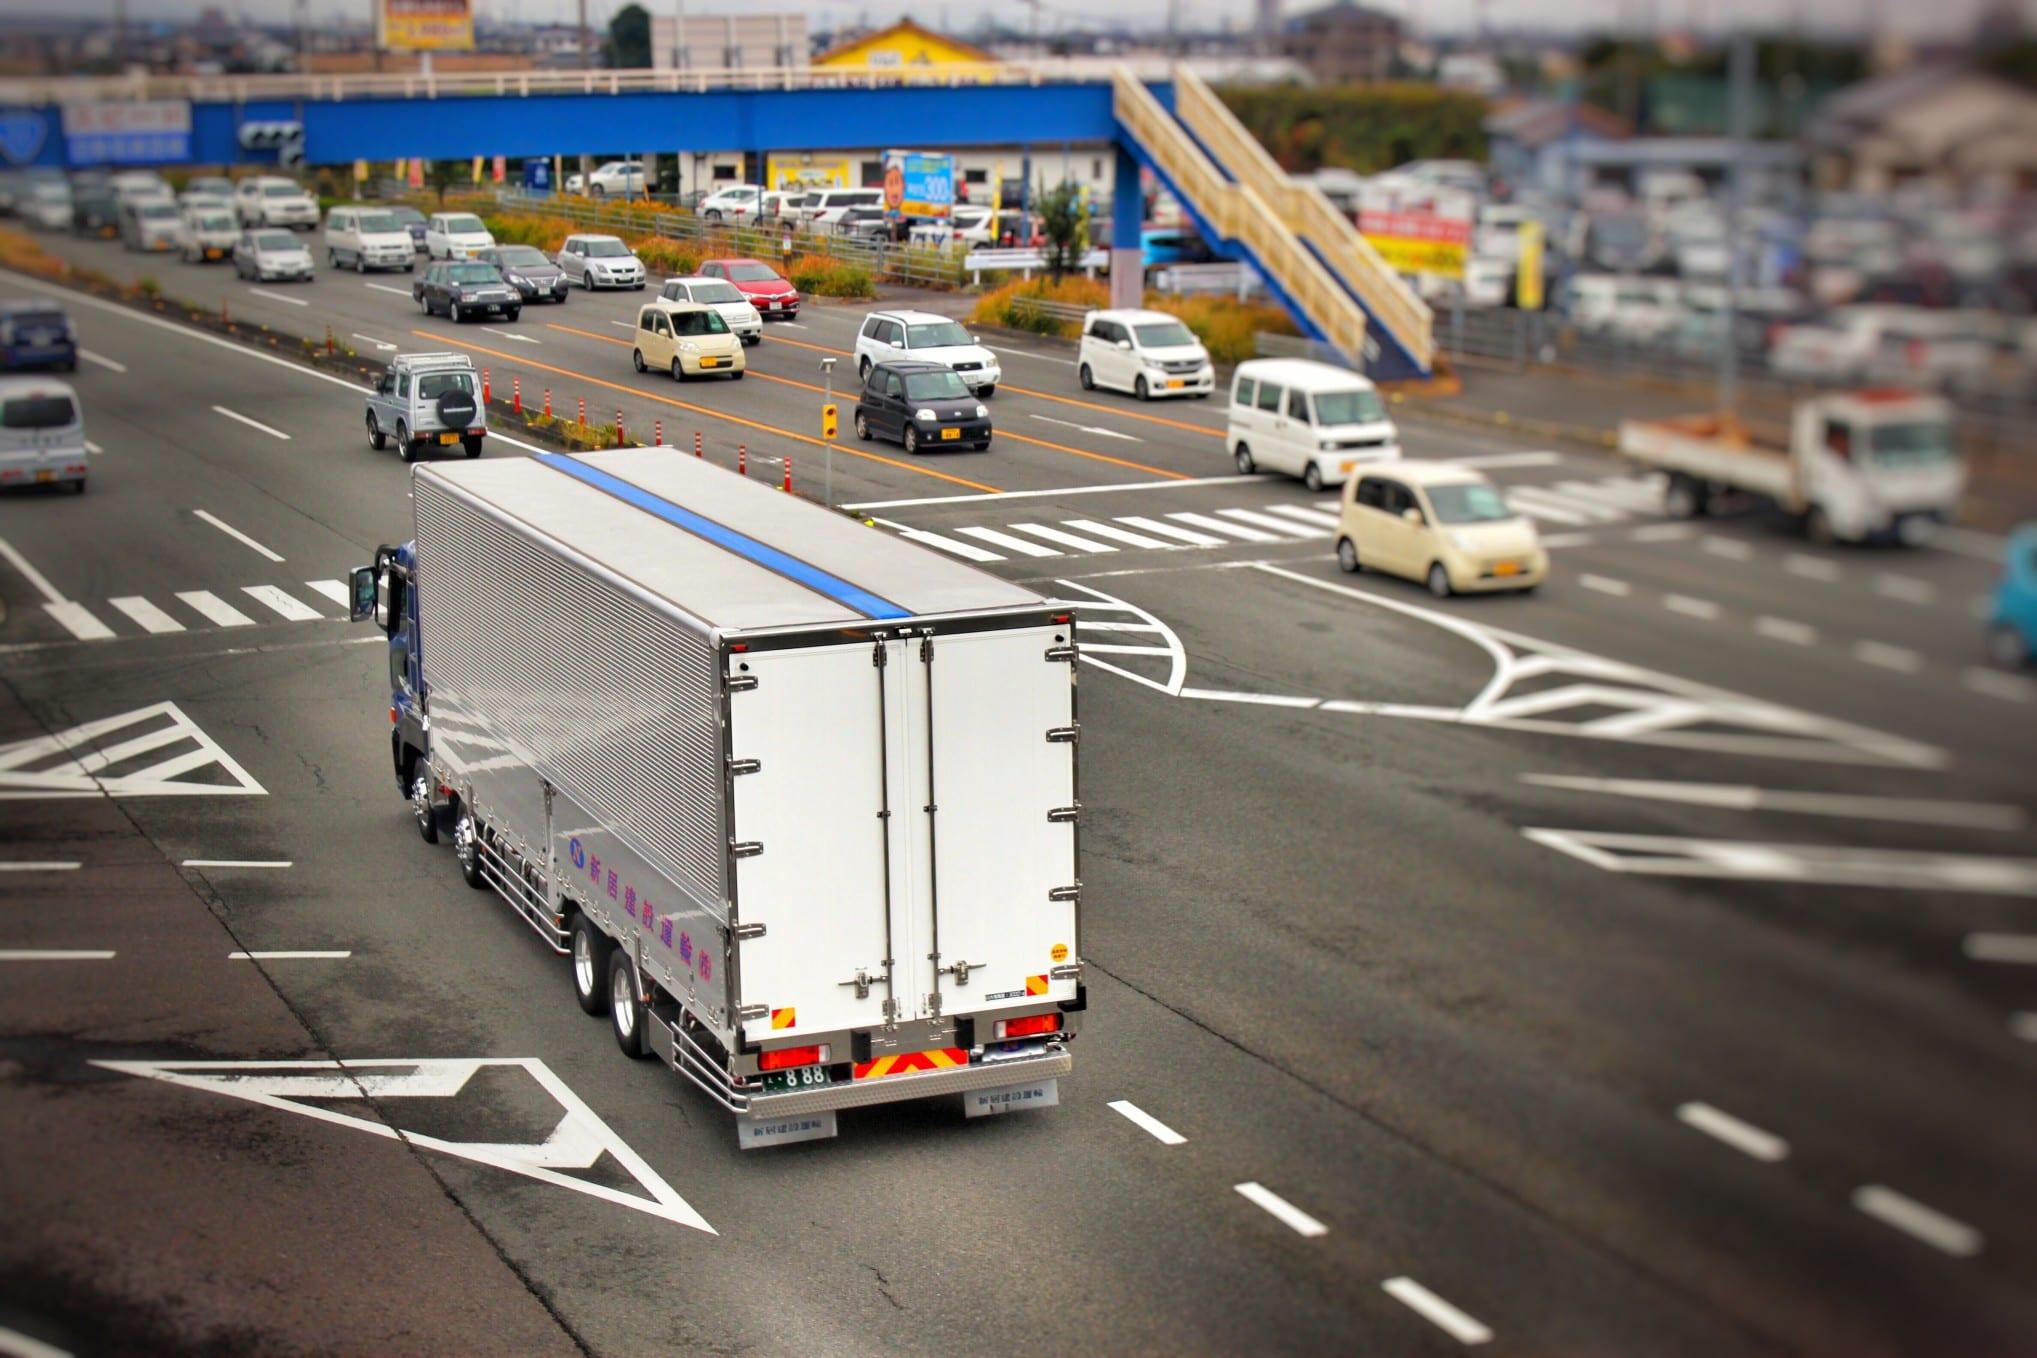 Leveraging Fleet Analytics Tech to Improve Driver Safety